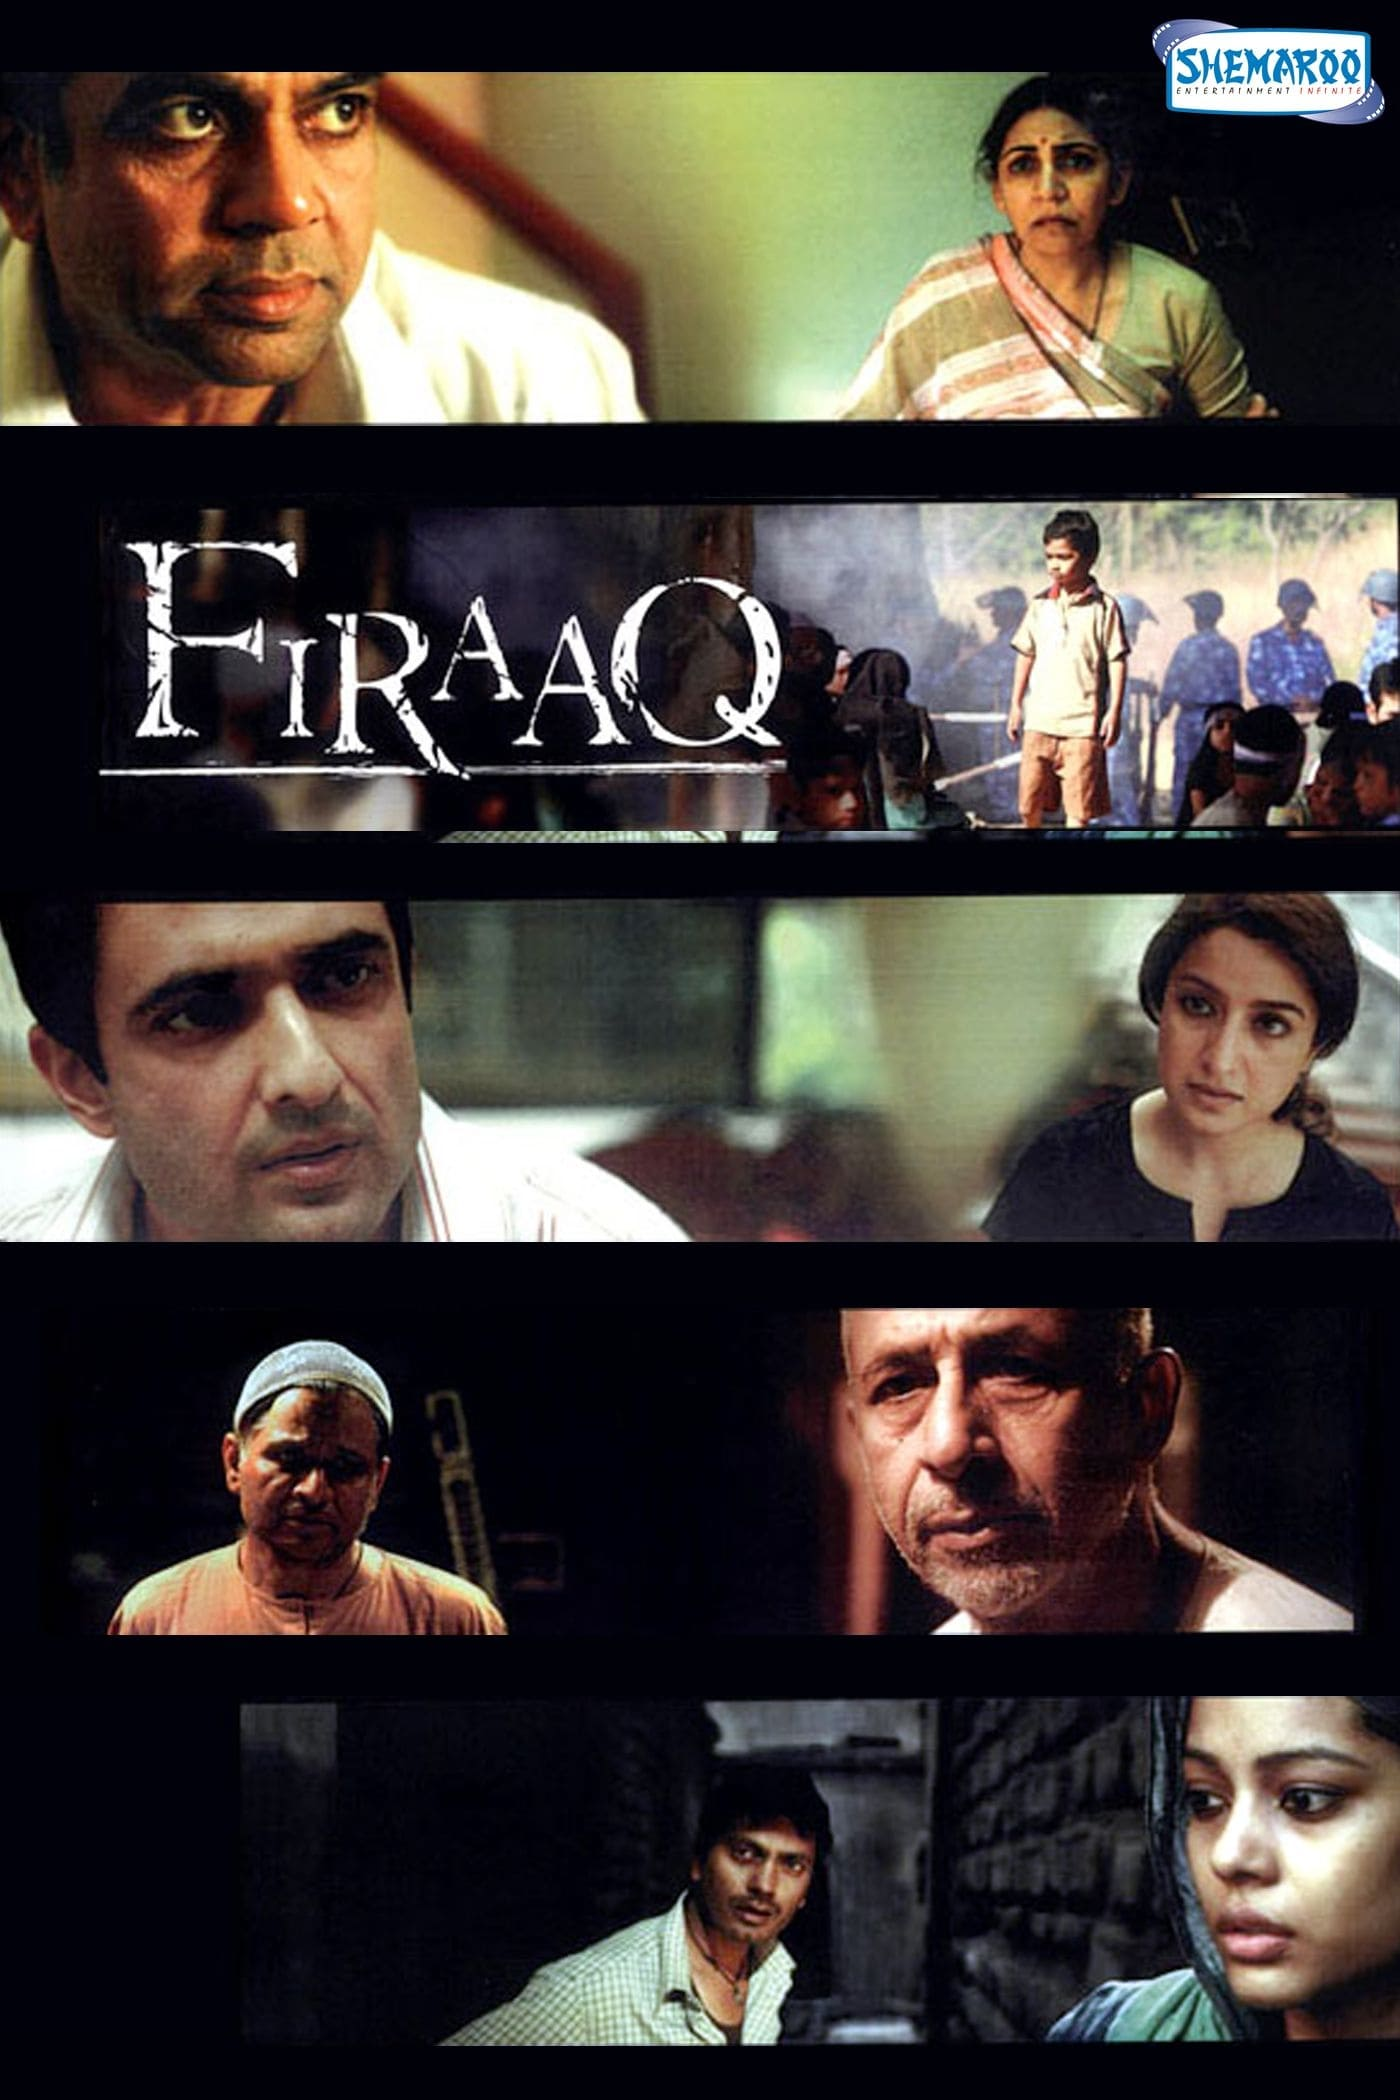 Firaaq Movie Streaming Online Watch on Amazon, Google Play, Jio Cinema, MX Player, Shemaroo Me, Tata Sky , Youtube, Zee5